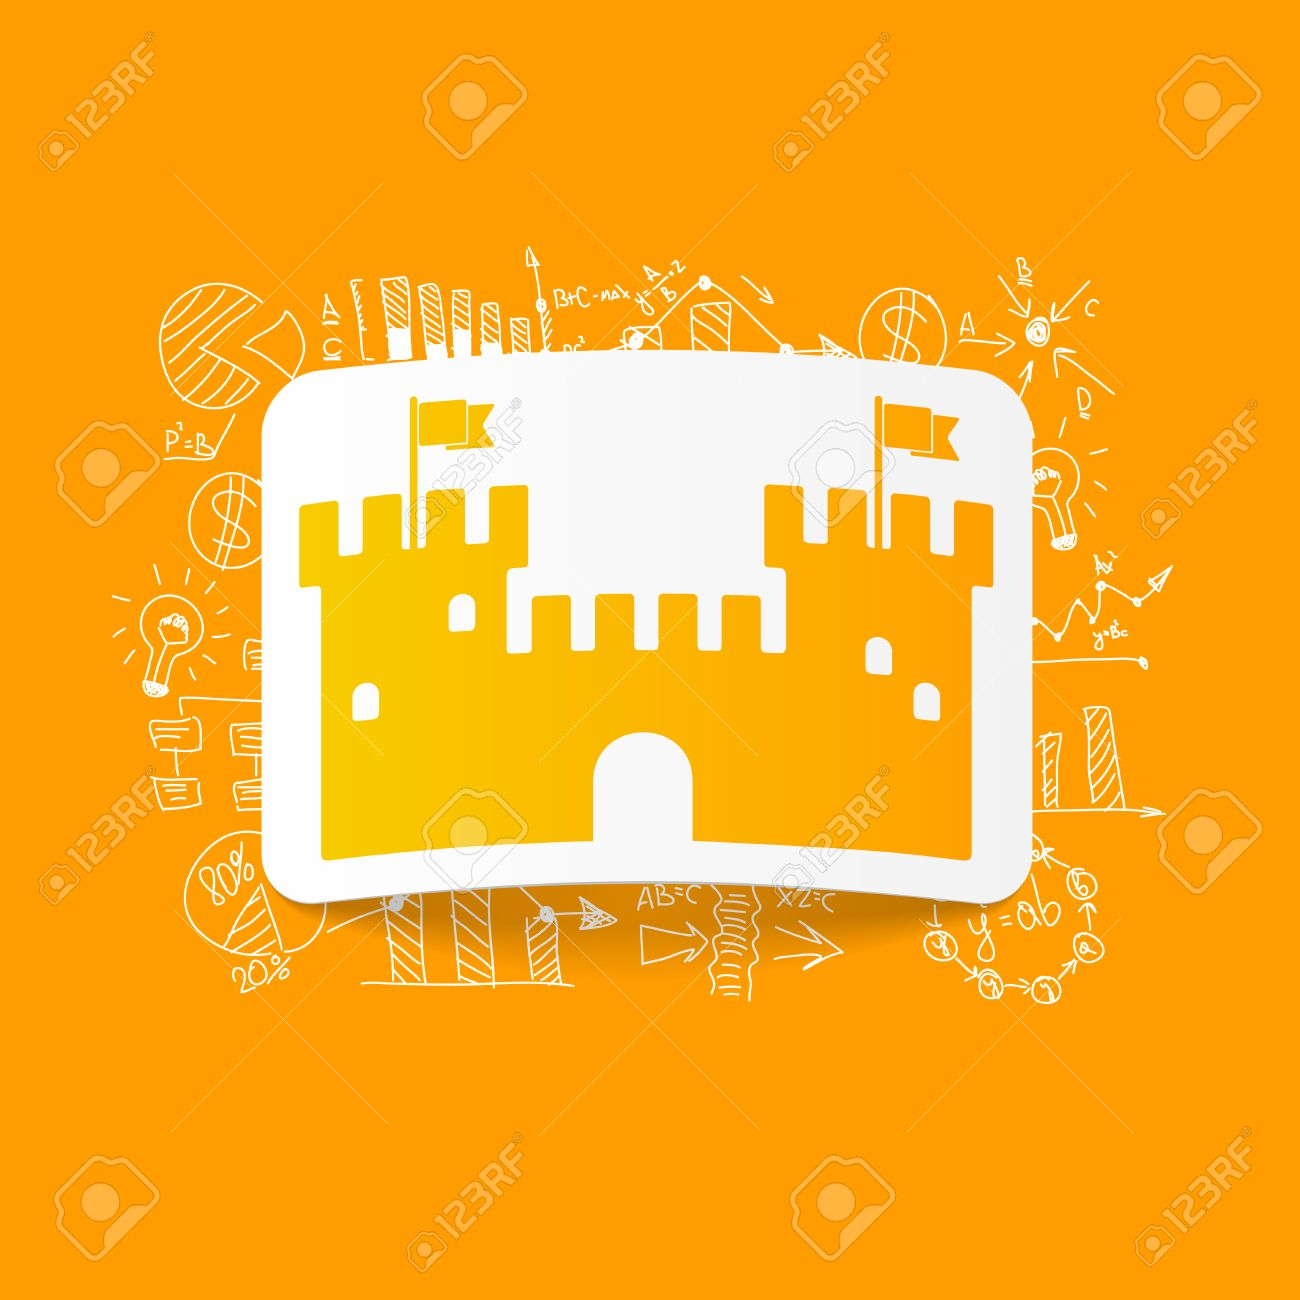 Disegno Formule Commerciali: Fortezza Clipart Royalty.